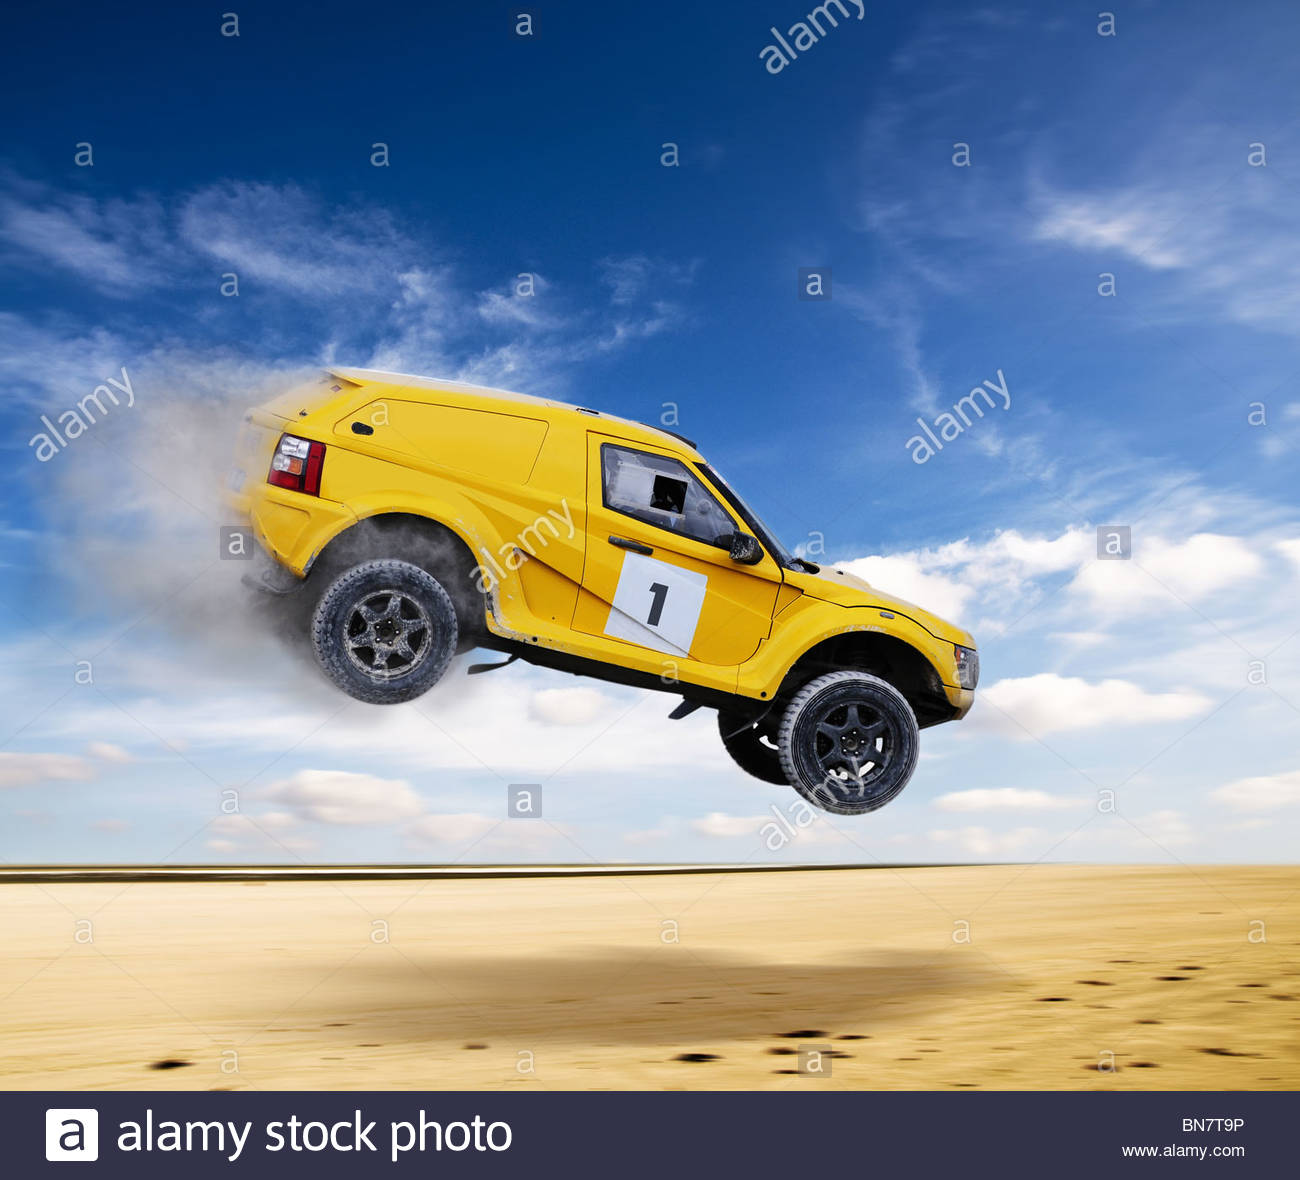 desert rally - Stock Image